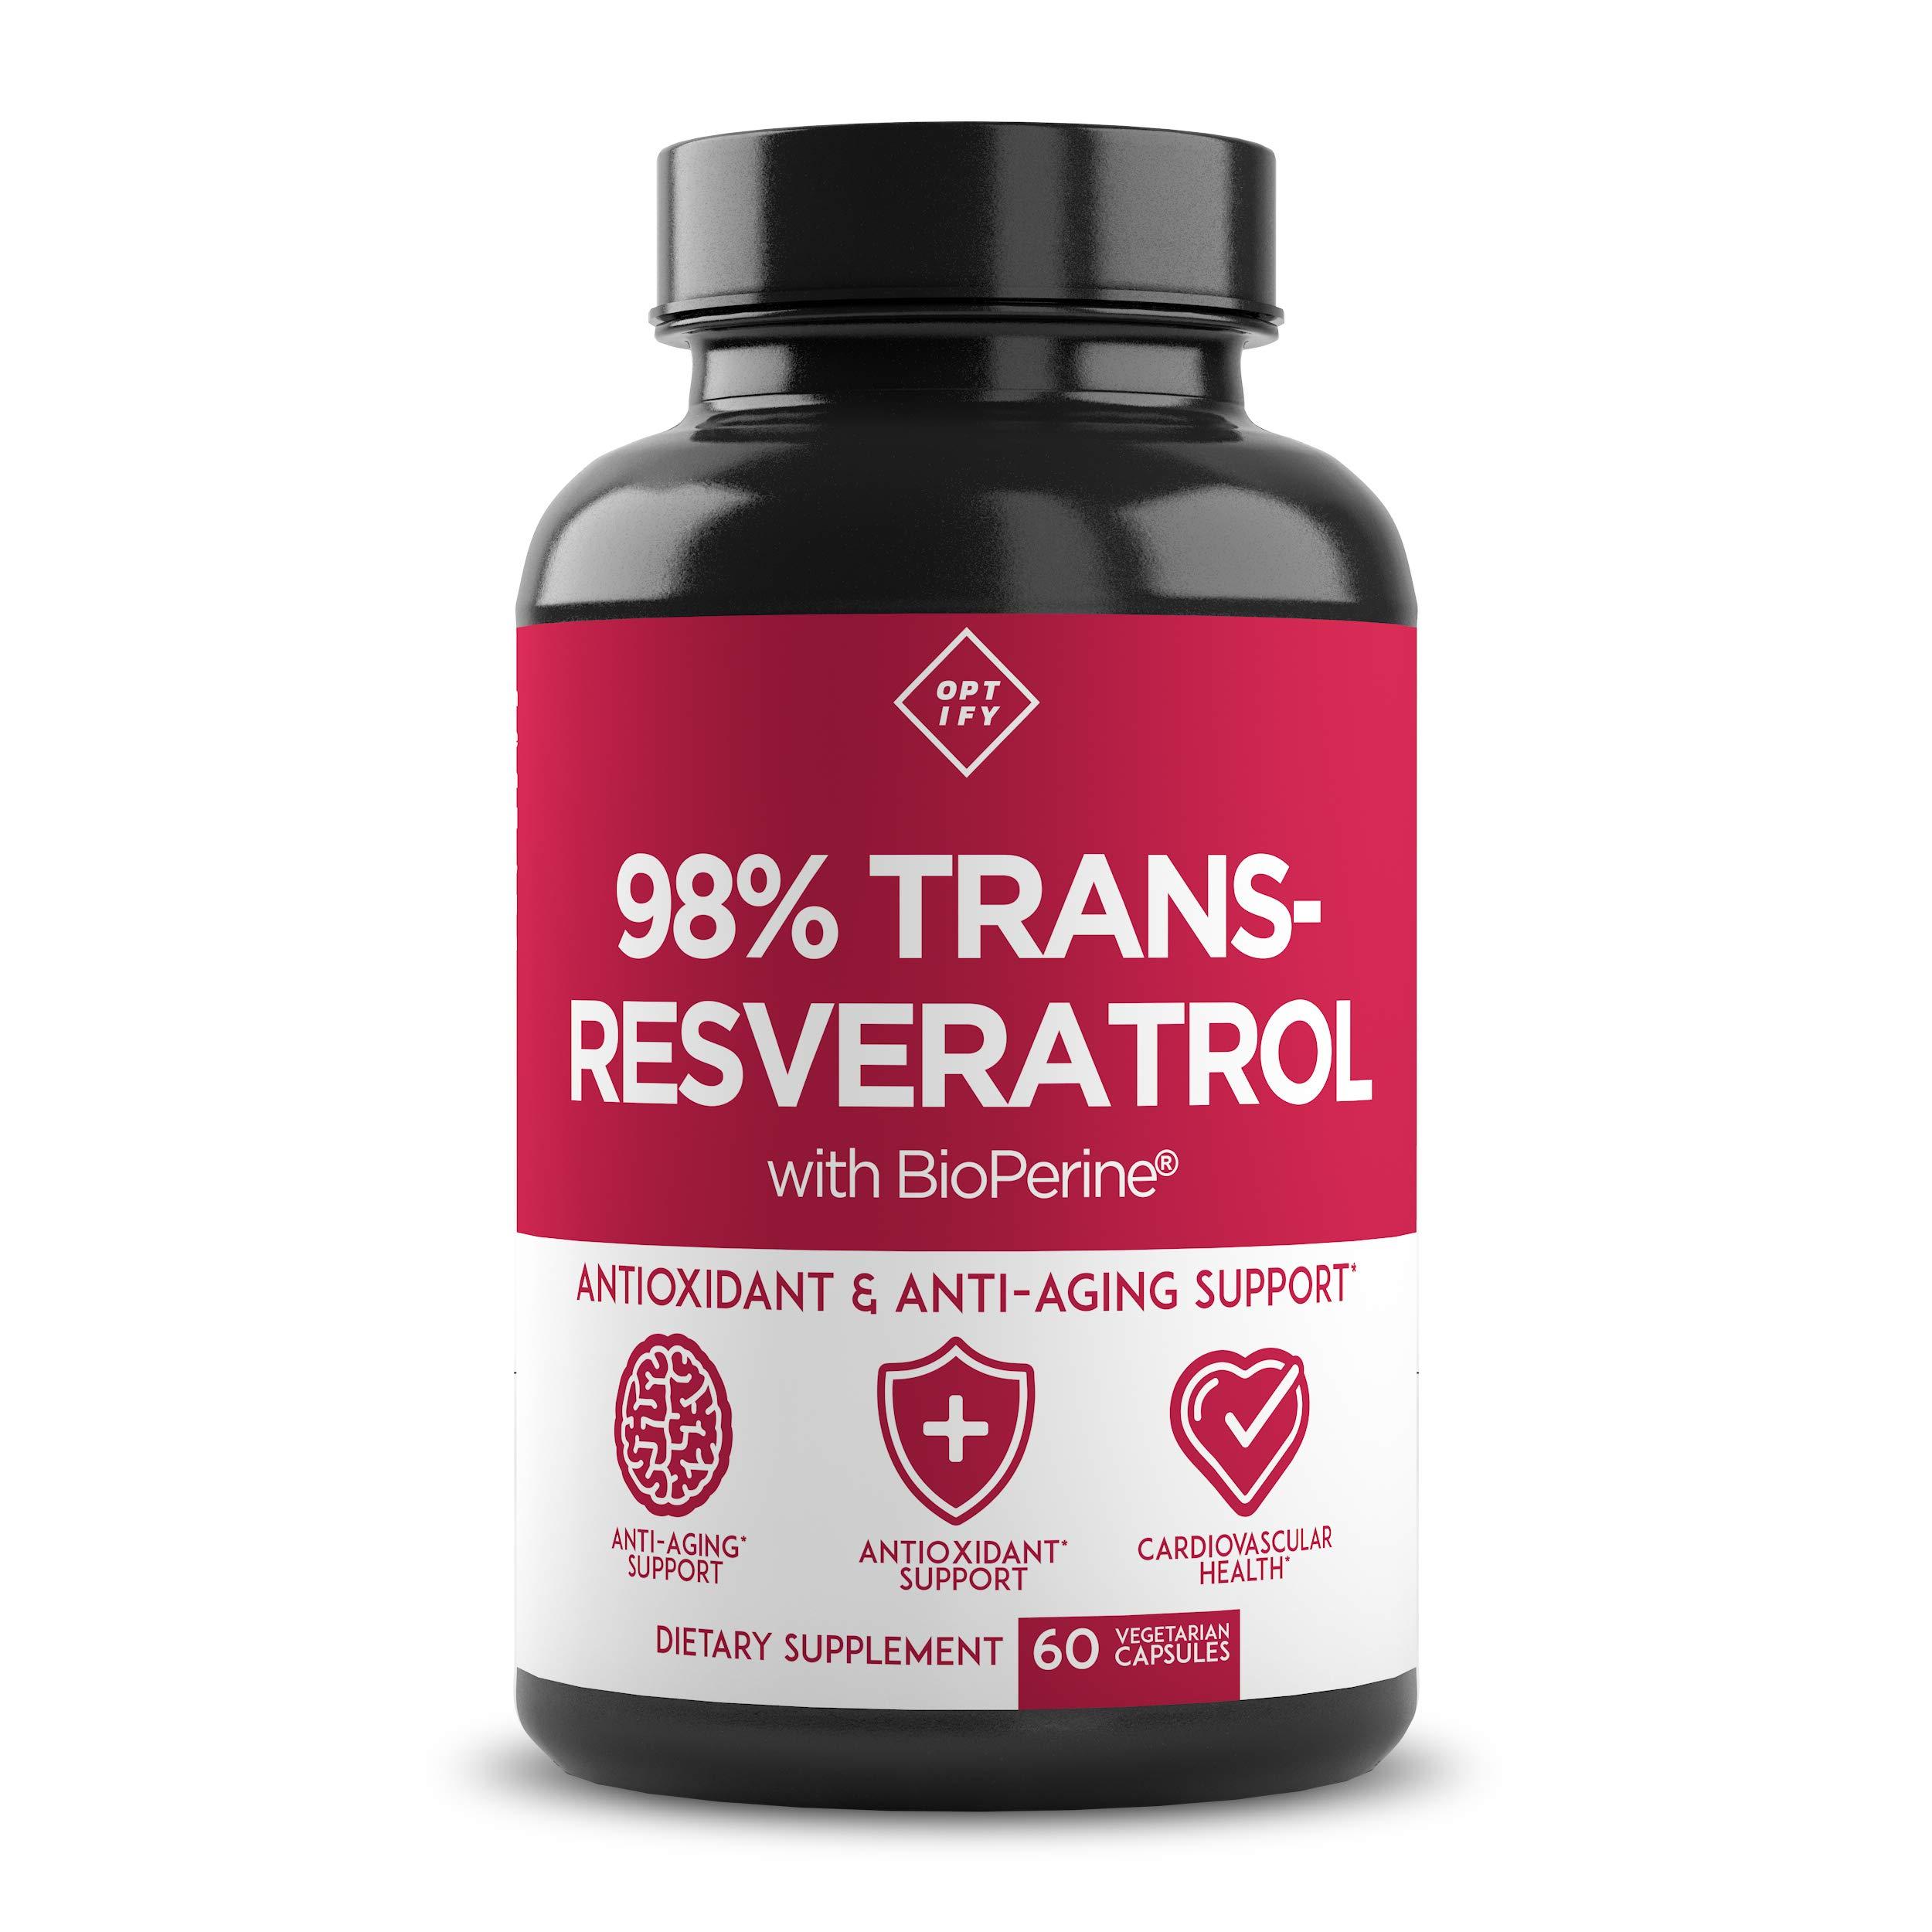 New Ultra Therapeutic Resveratrol Supplement - 98% Trans Resveratrol Plus BioPerine - Antioxidant Supplement for Anti Aging and Longevity - 60 Capsule Reservatrol Supplement